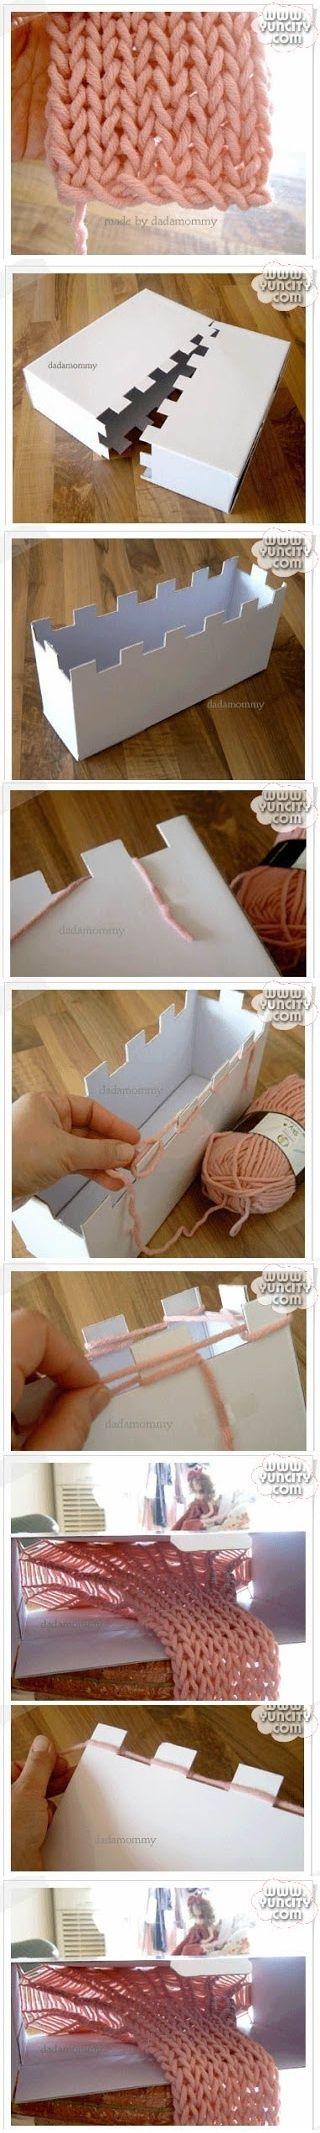 Circular knitting without needles.